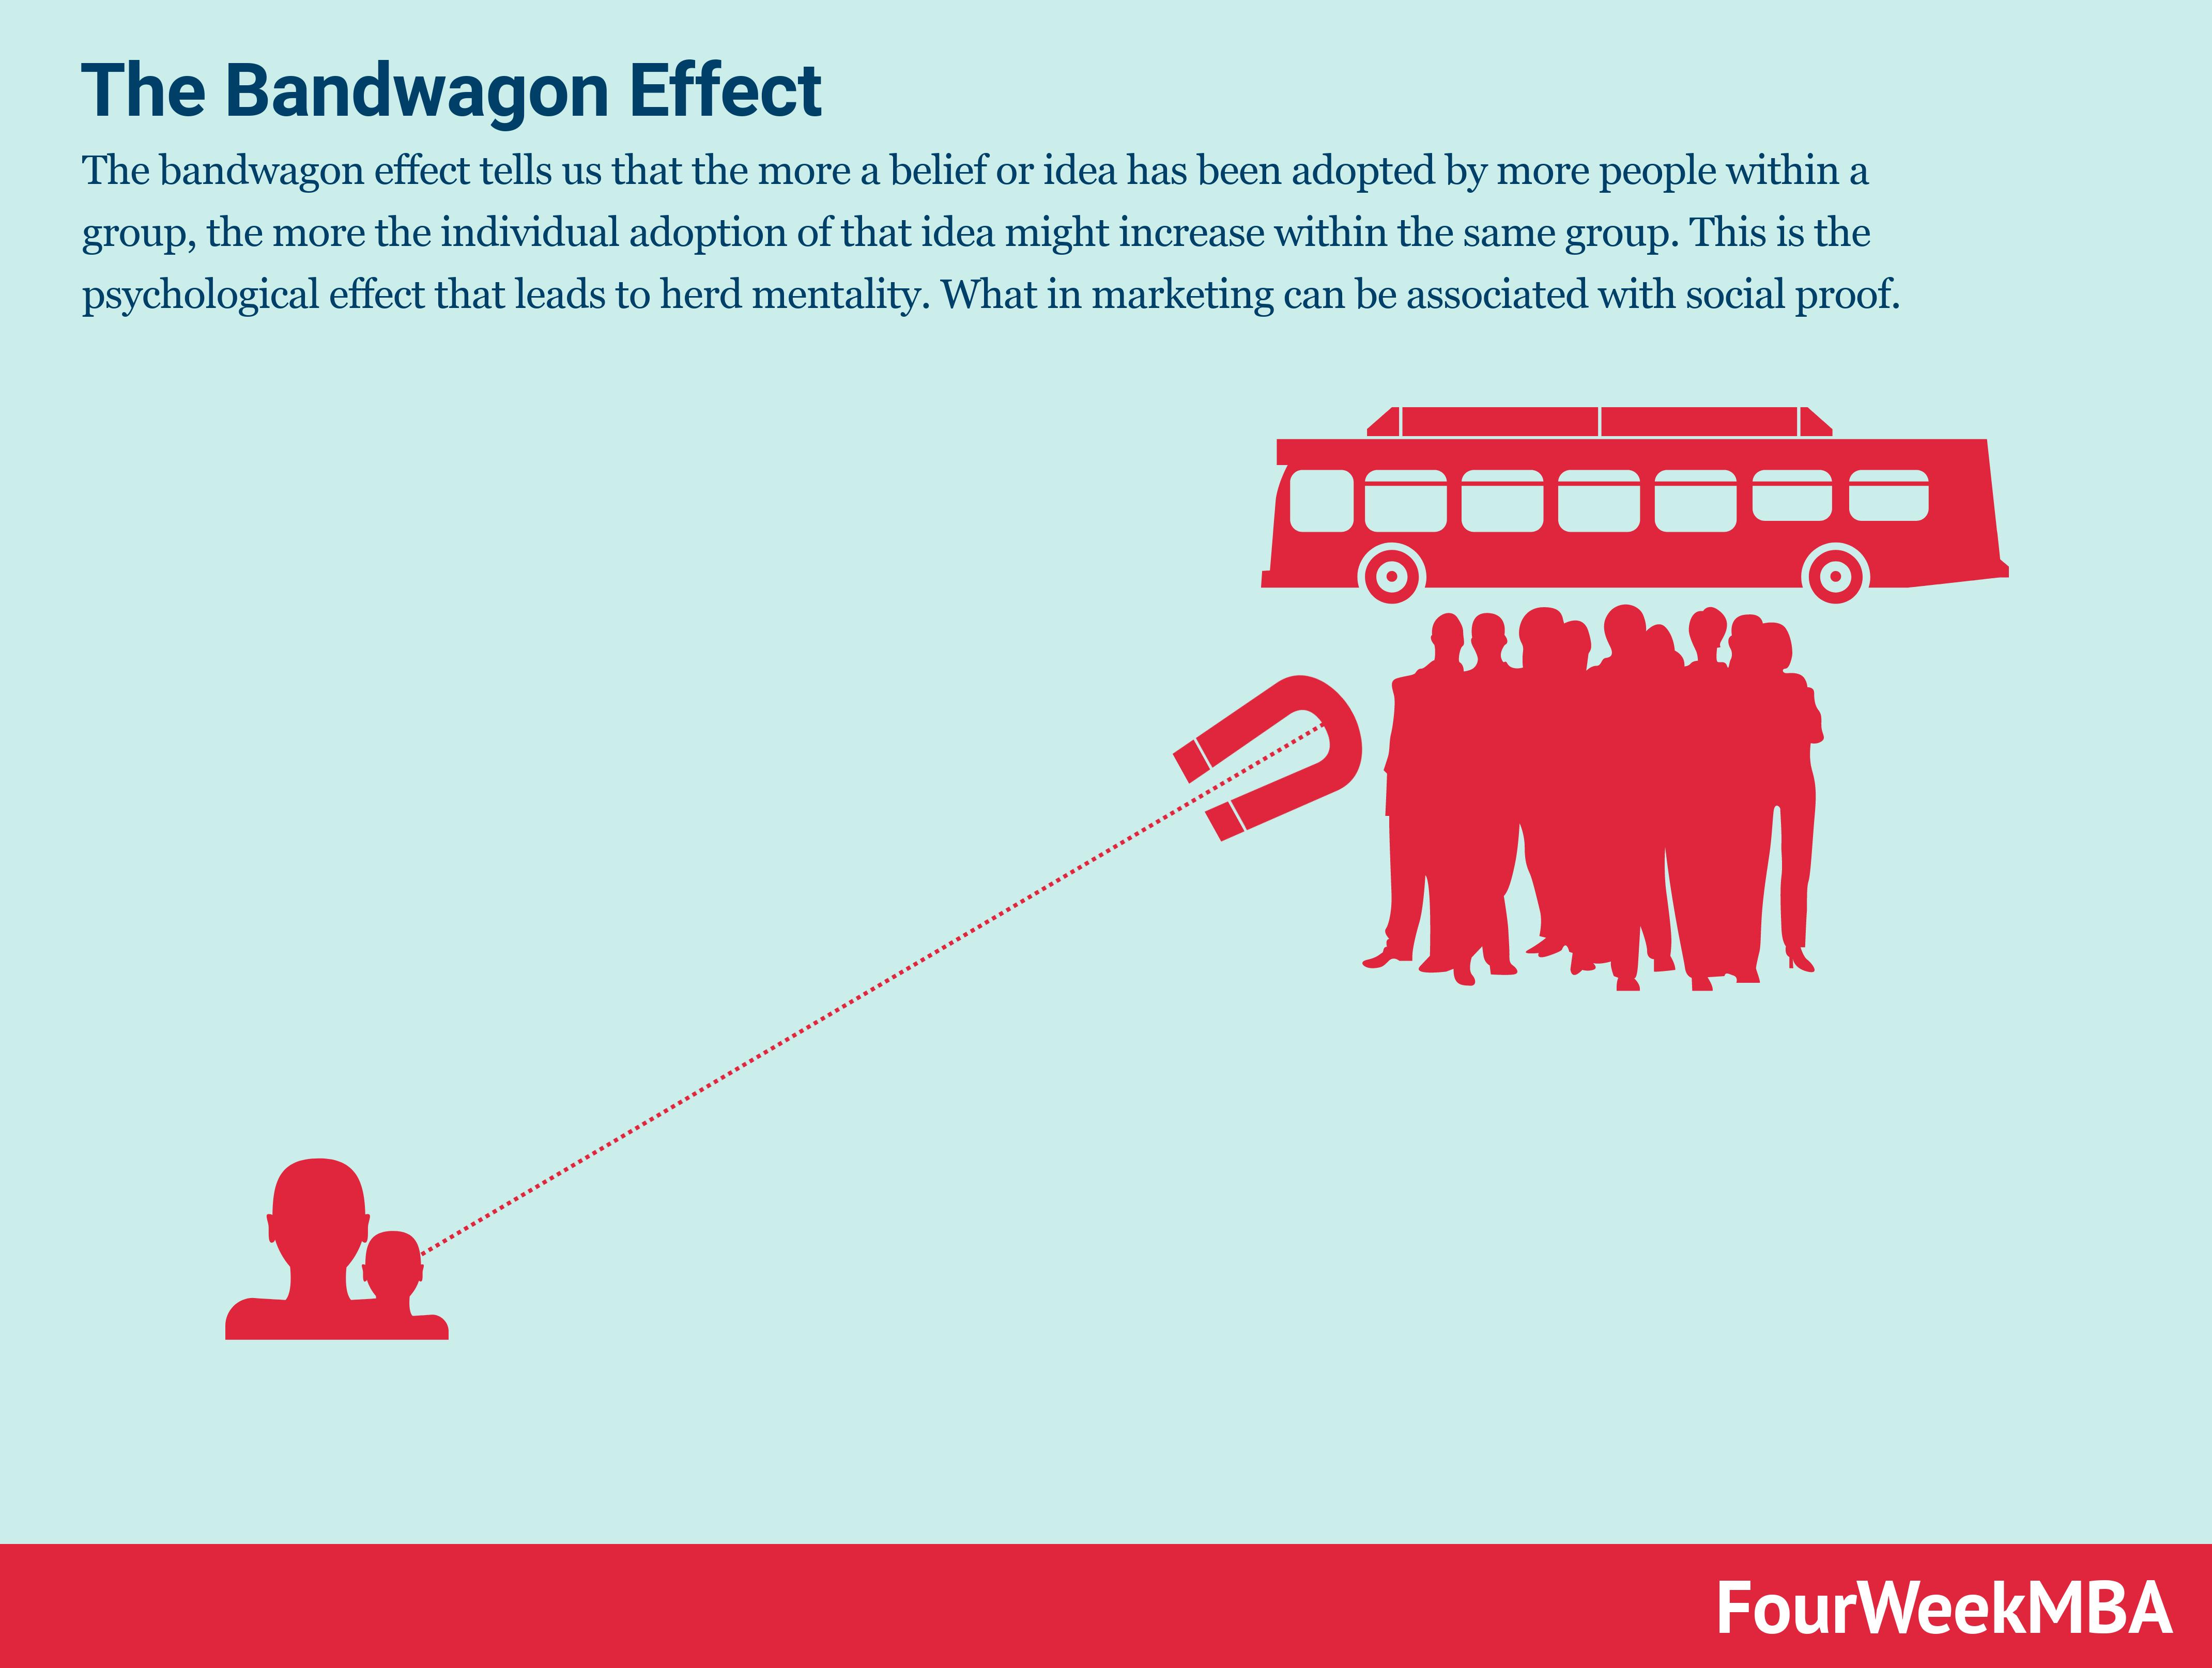 bandwagon-effect